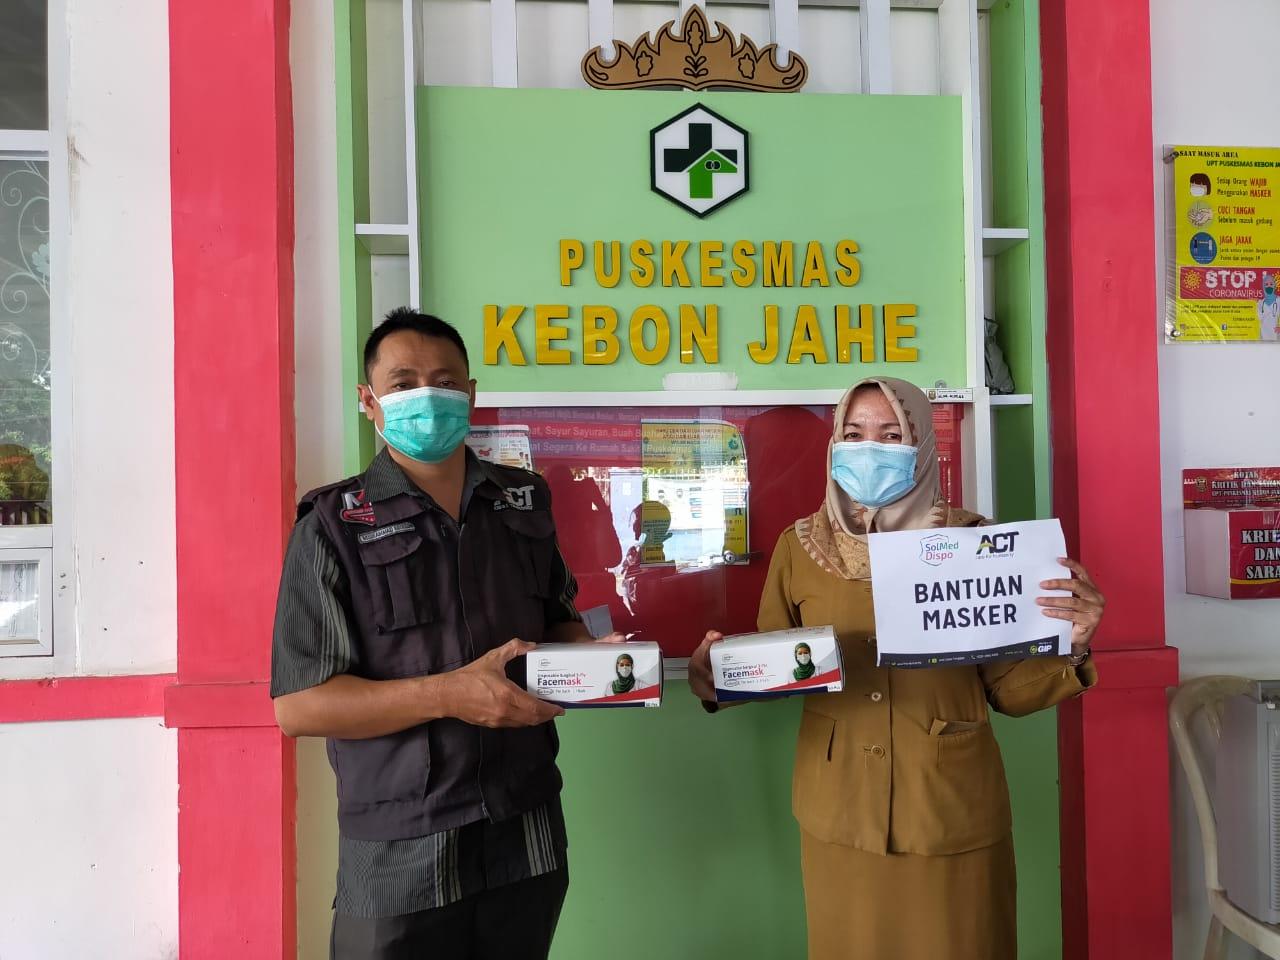 ACT Lampung Masih Menerima Bantuan Alat Pelindung Diri (APD) untuk Petugas Kesehatan